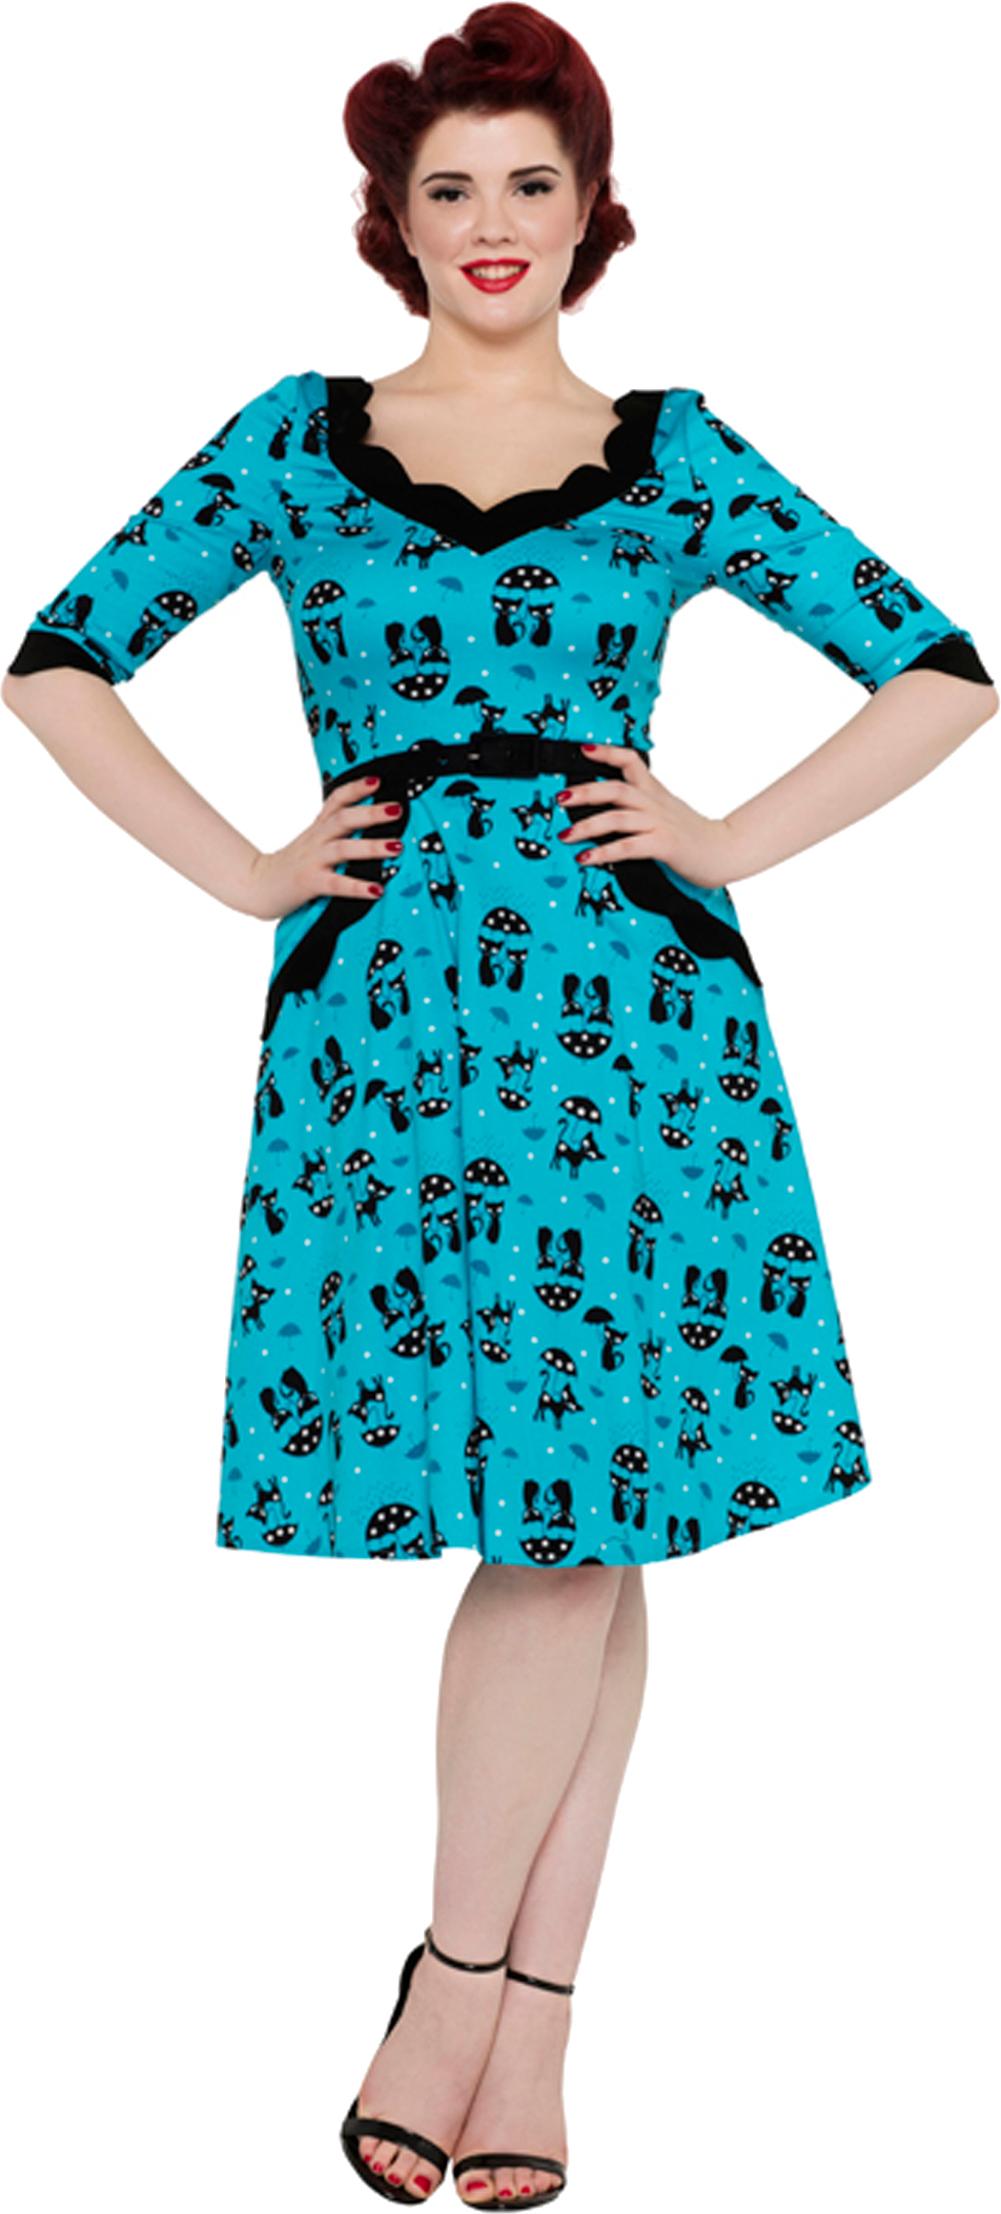 Pretty Kitty Mode Weiß Blau Vintage Blumen Blüte Rockabilly Swing Kleid